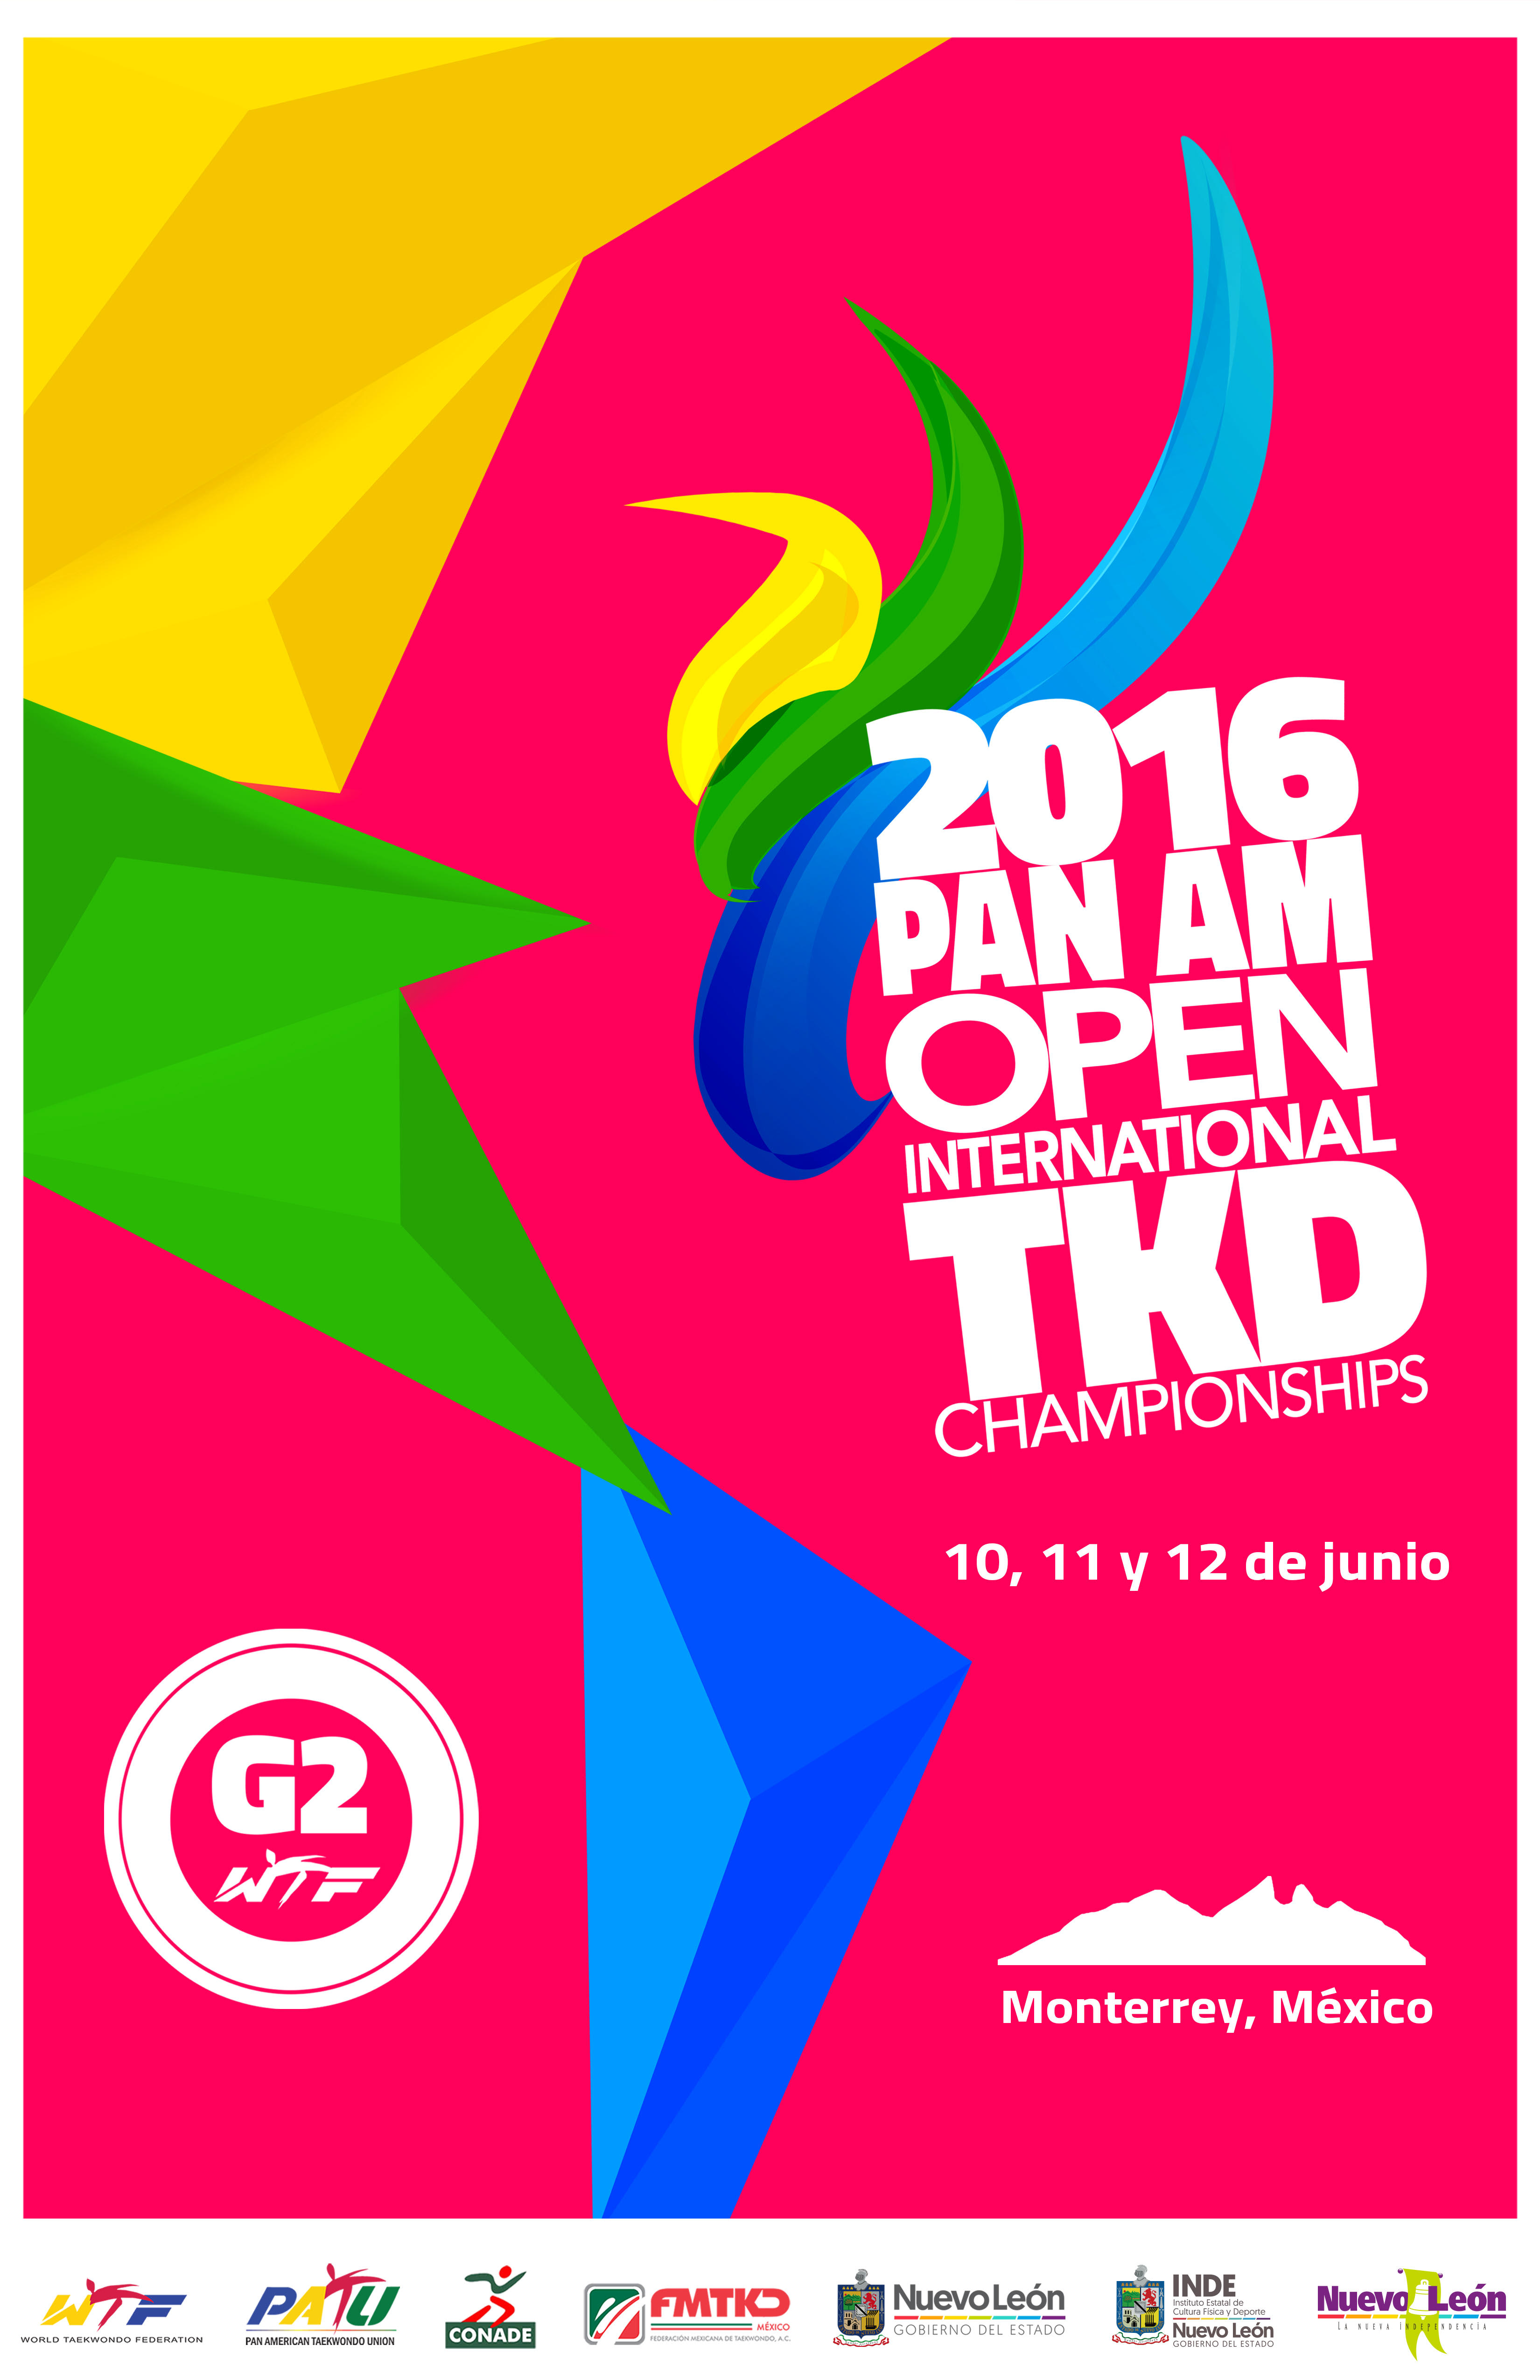 panam_open_2016